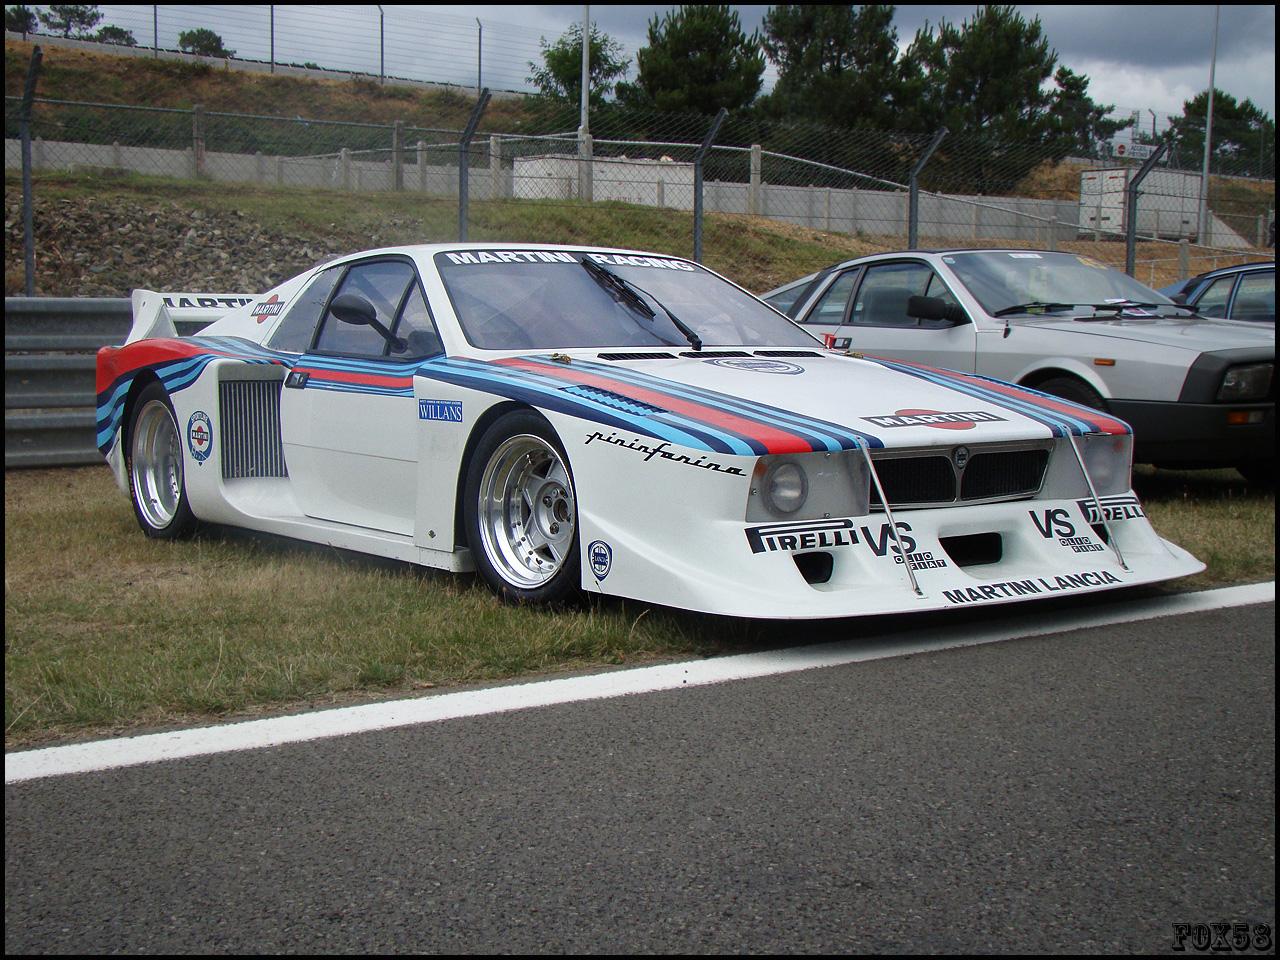 http://1.bp.blogspot.com/-t0BO1lK9emw/TV2Oz2_MHUI/AAAAAAAACdU/bNOVel3sMIs/s1600/Lancia+Beta+Montecarlo+Turbo+5.jpg